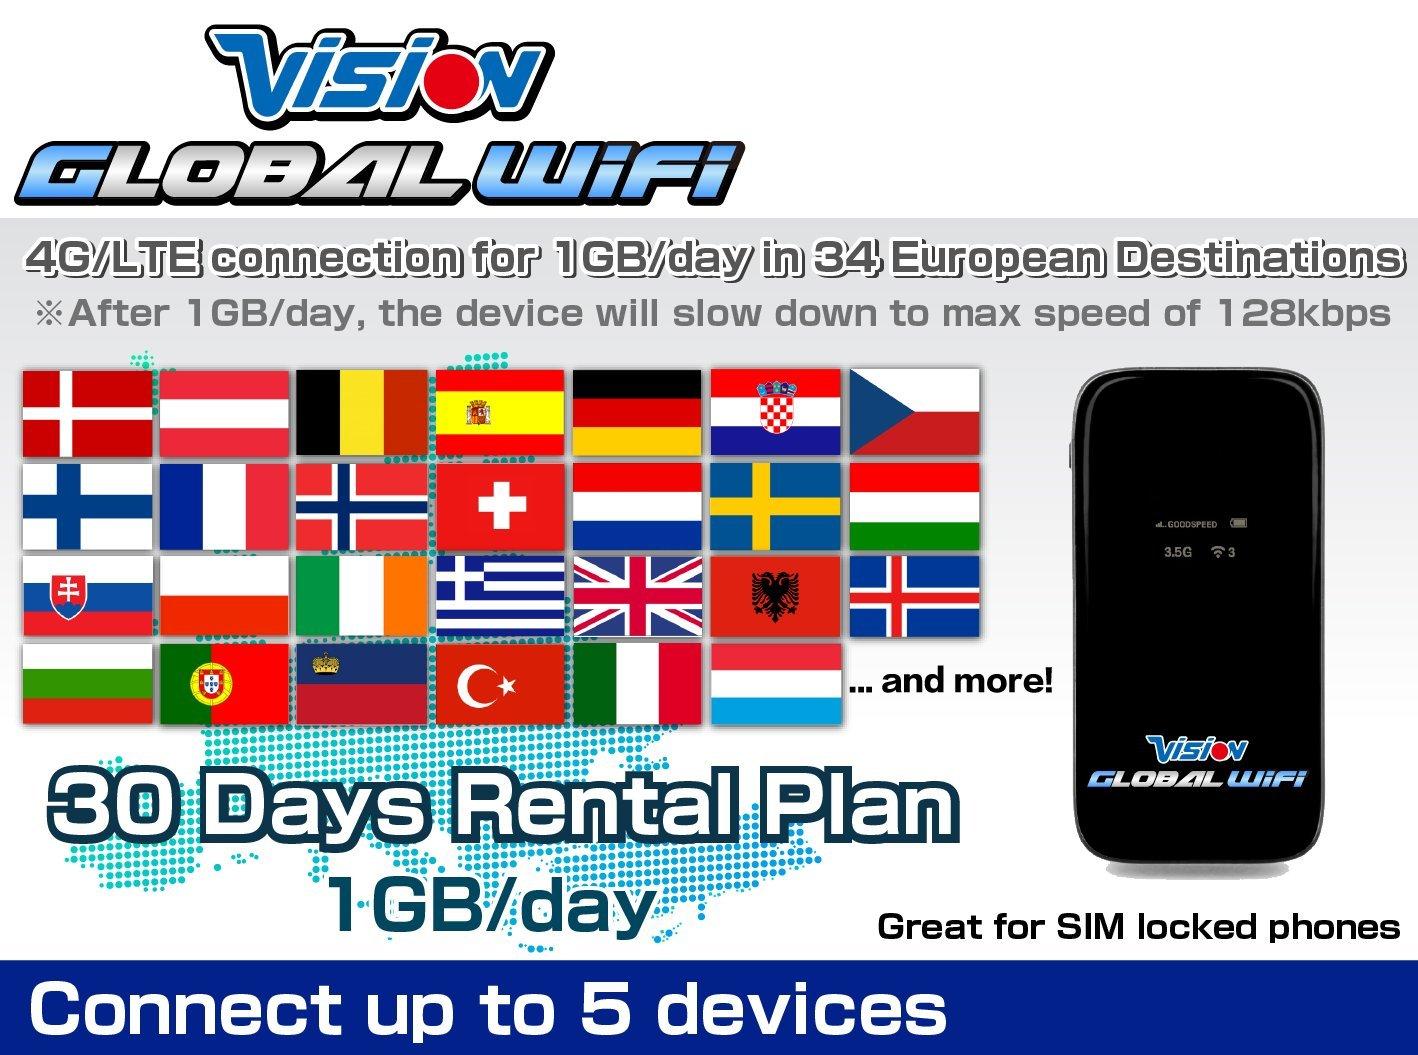 Vodafone SIM Card 4G/LTE Europe Mobile WiFi Hotspot Rentals 1GB/day - 30 Day